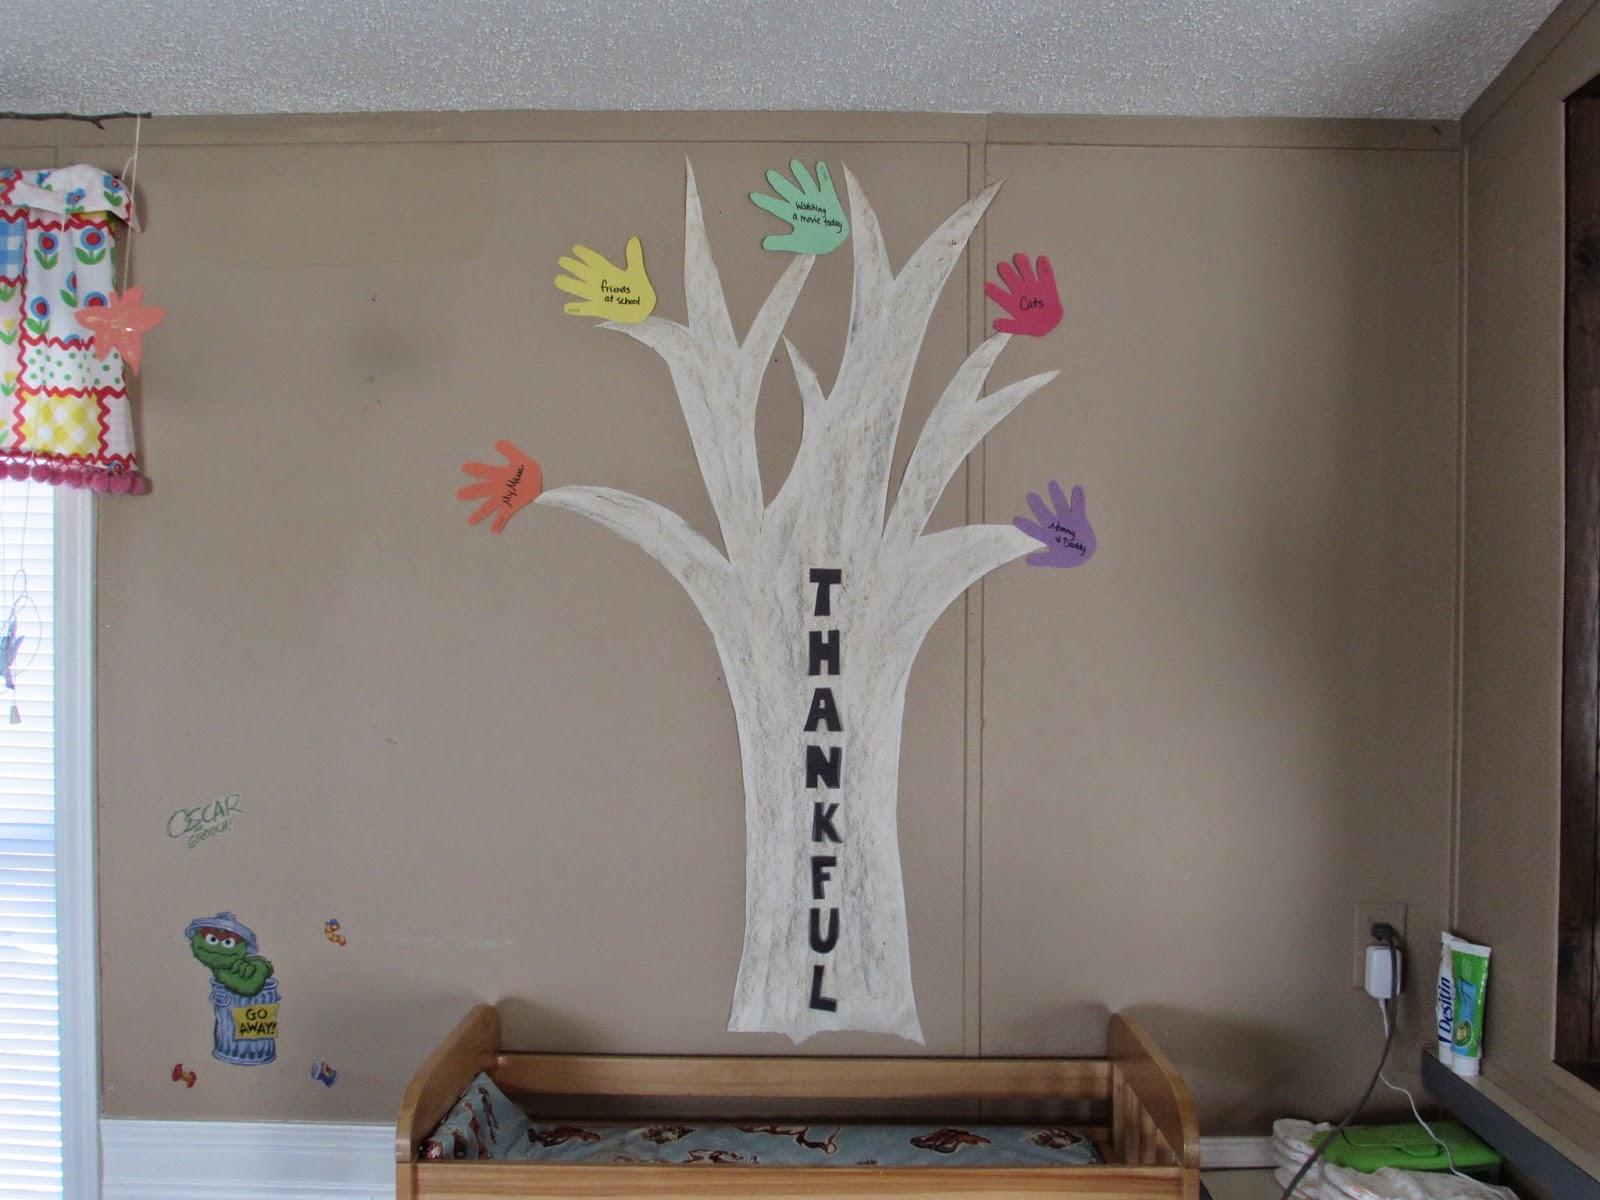 http://peppysis.blogspot.com/2014/11/dc-thankful-tree.html